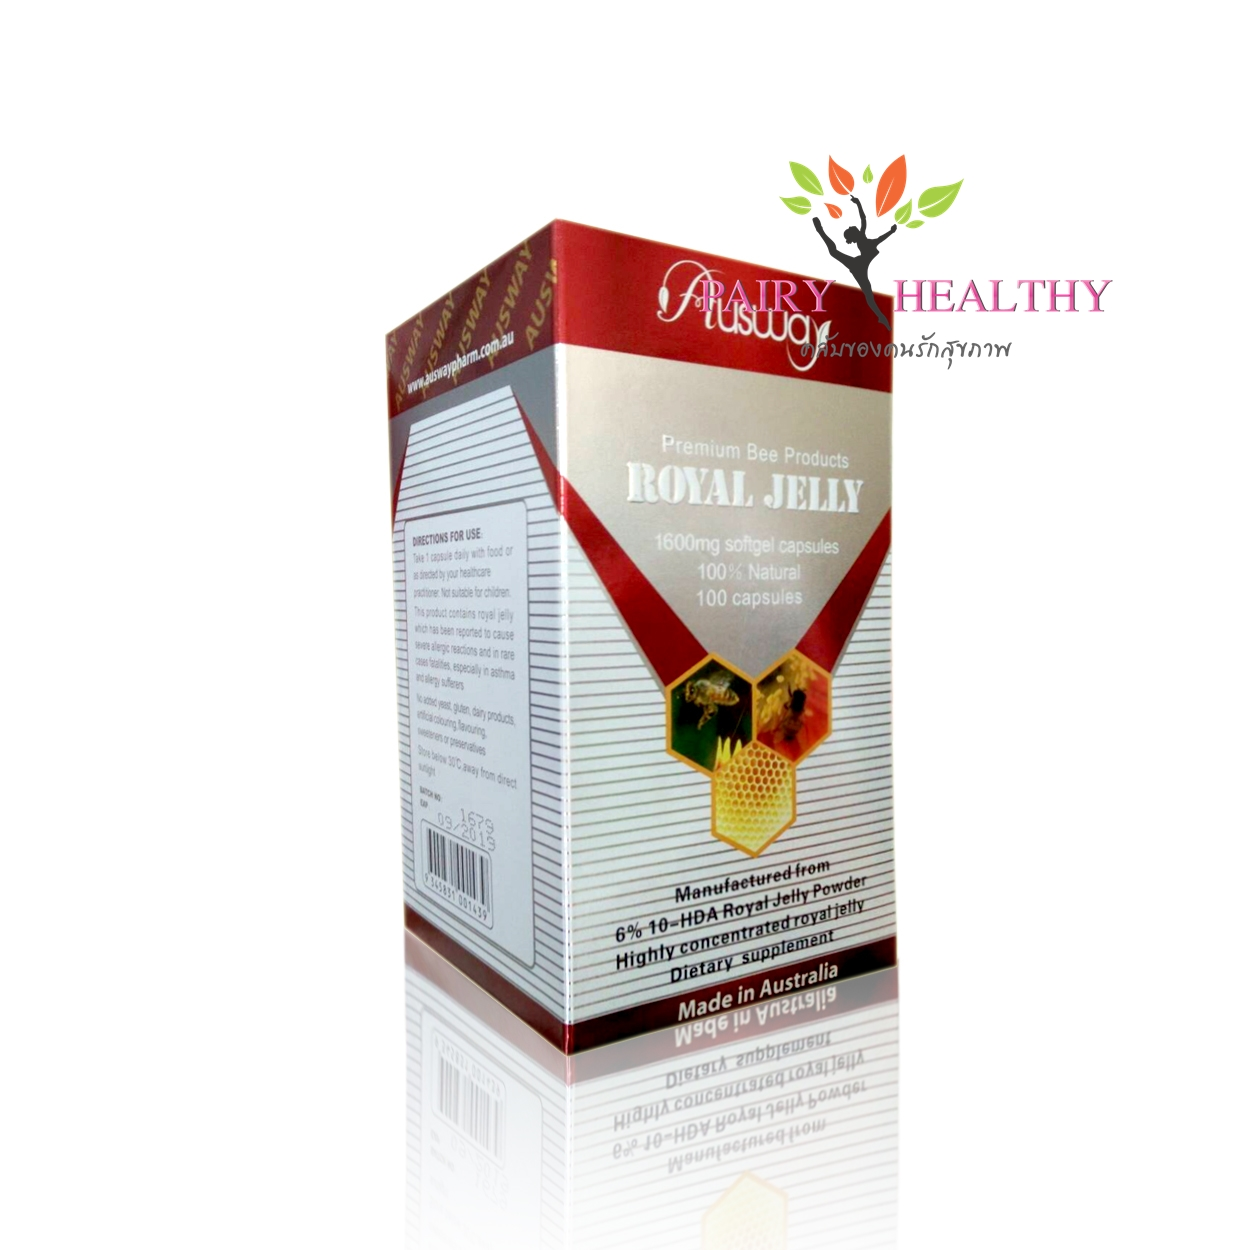 Ausway Premium royal jelly 1600mg 100 Softgels ราคา 1,090 บาท ส่งฟรี